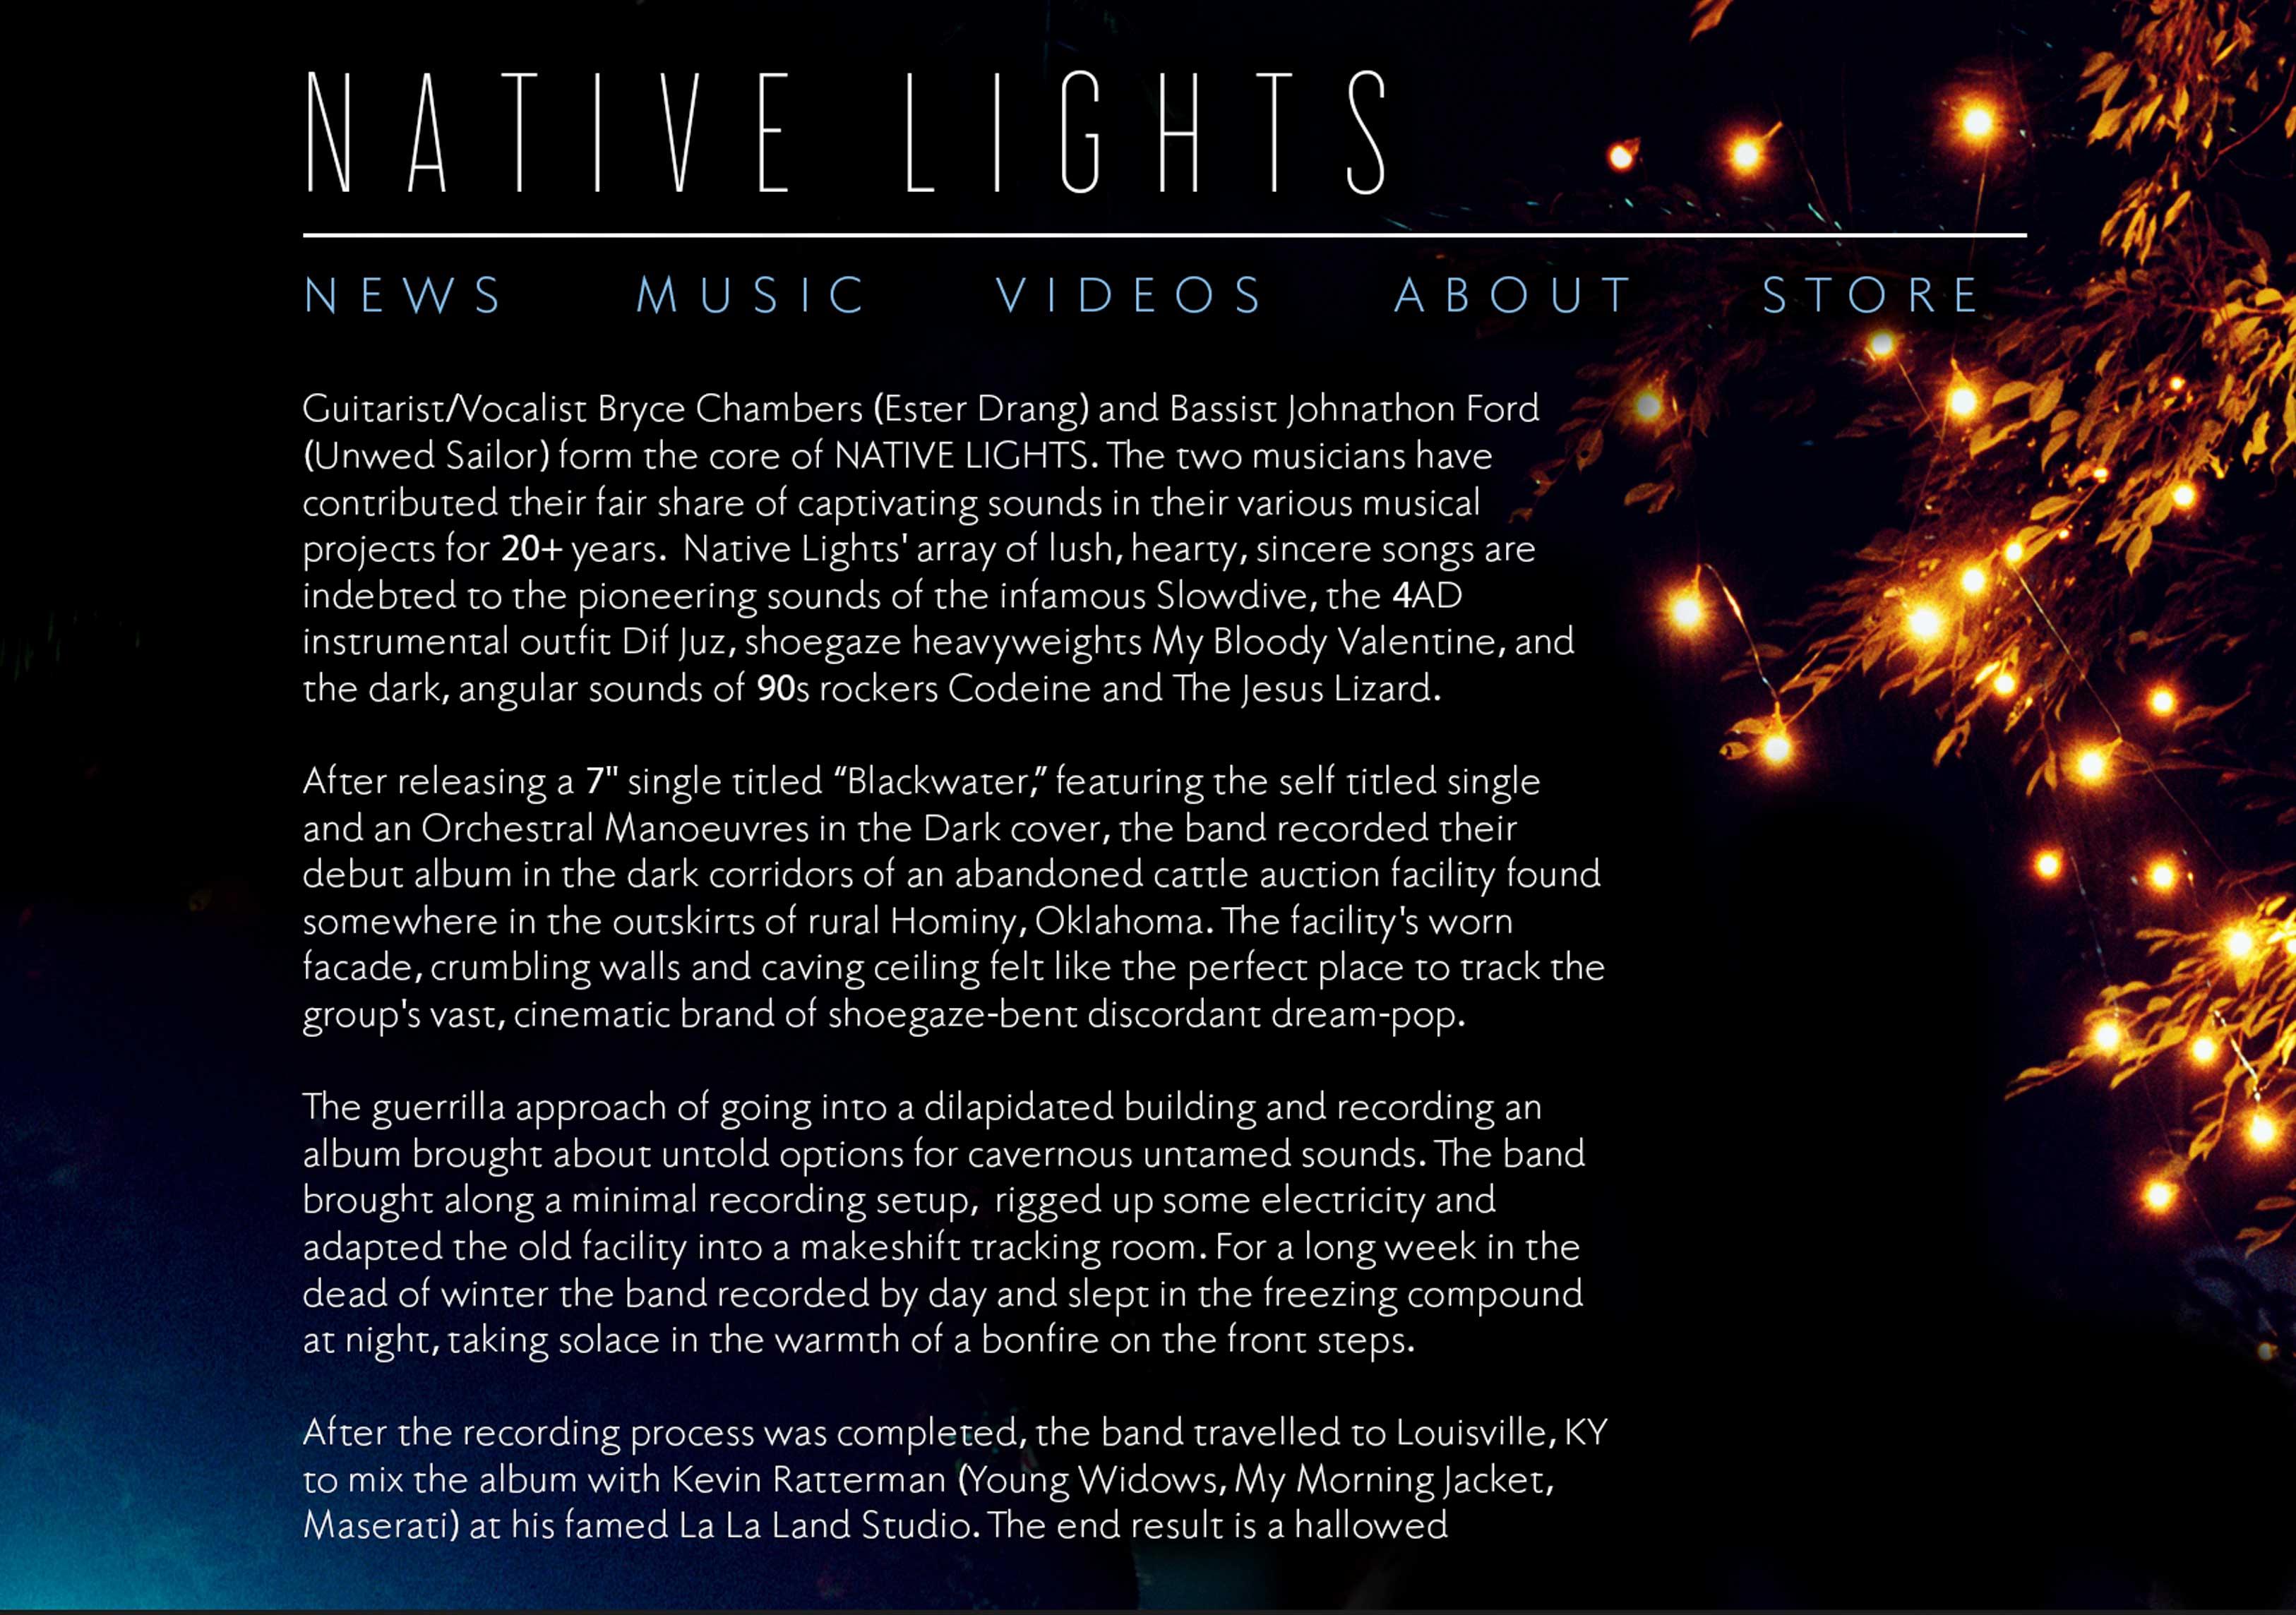 Native Lights